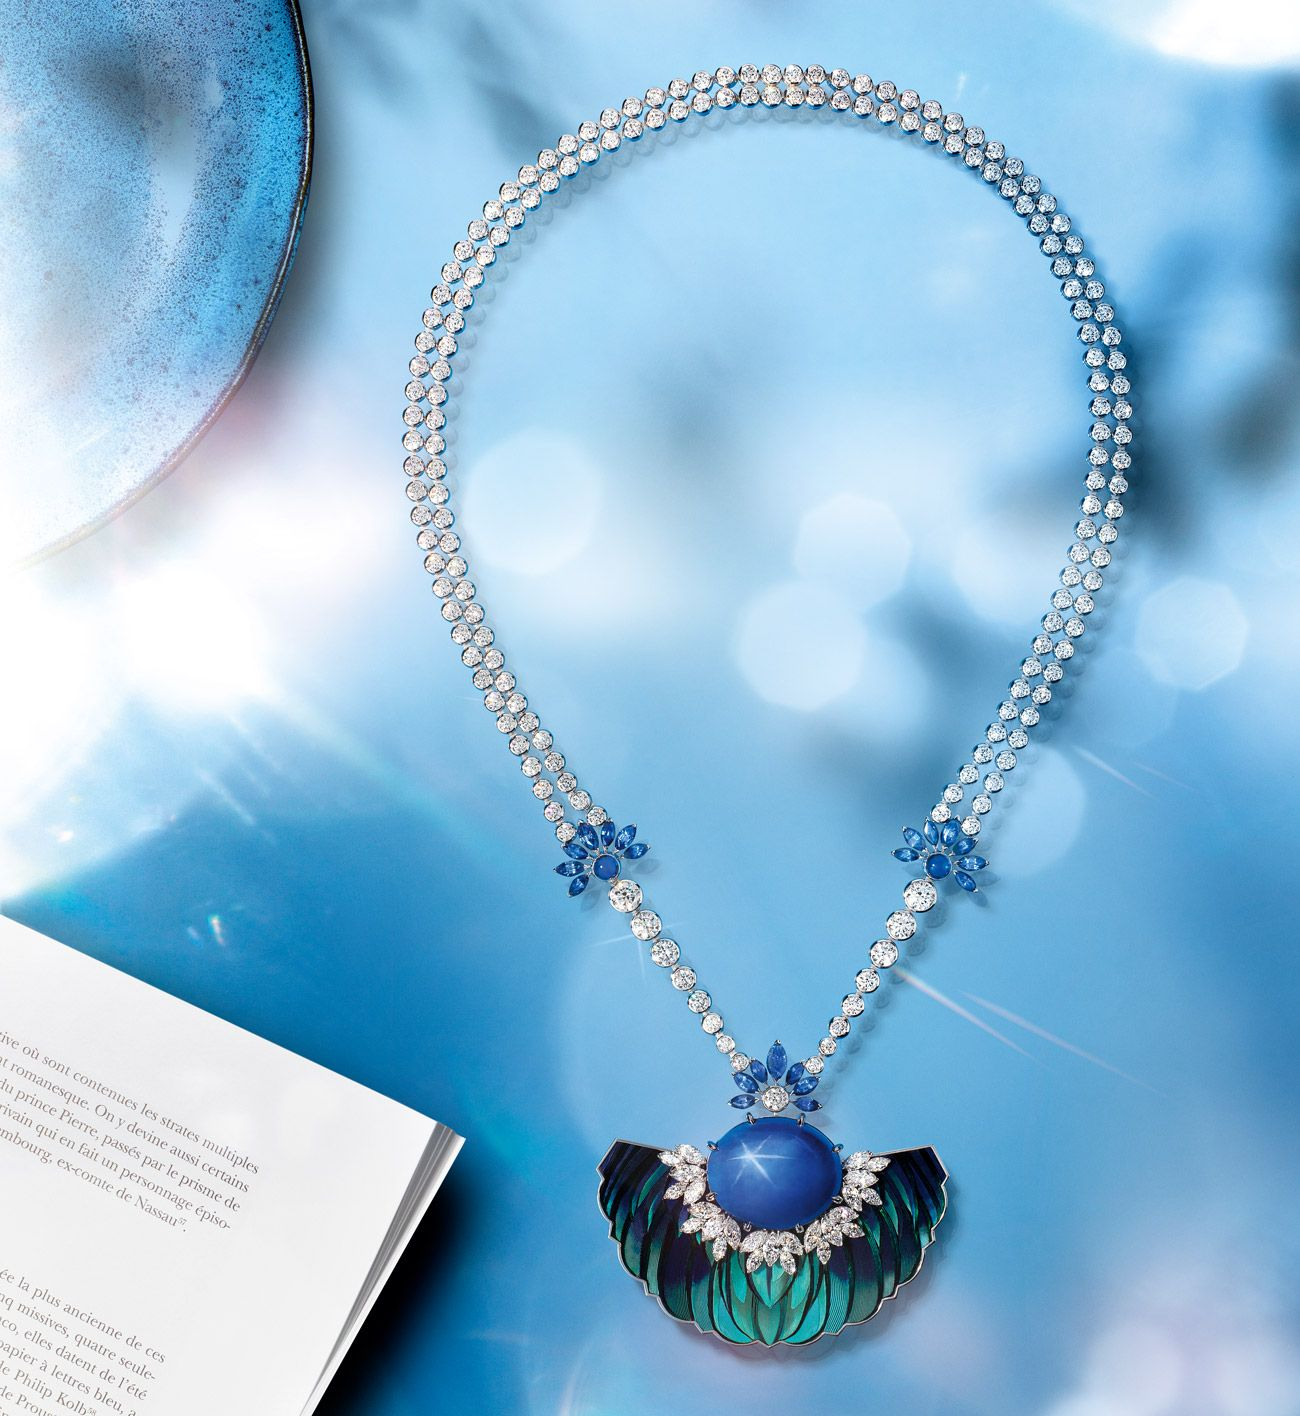 Celestial Blue Necklace